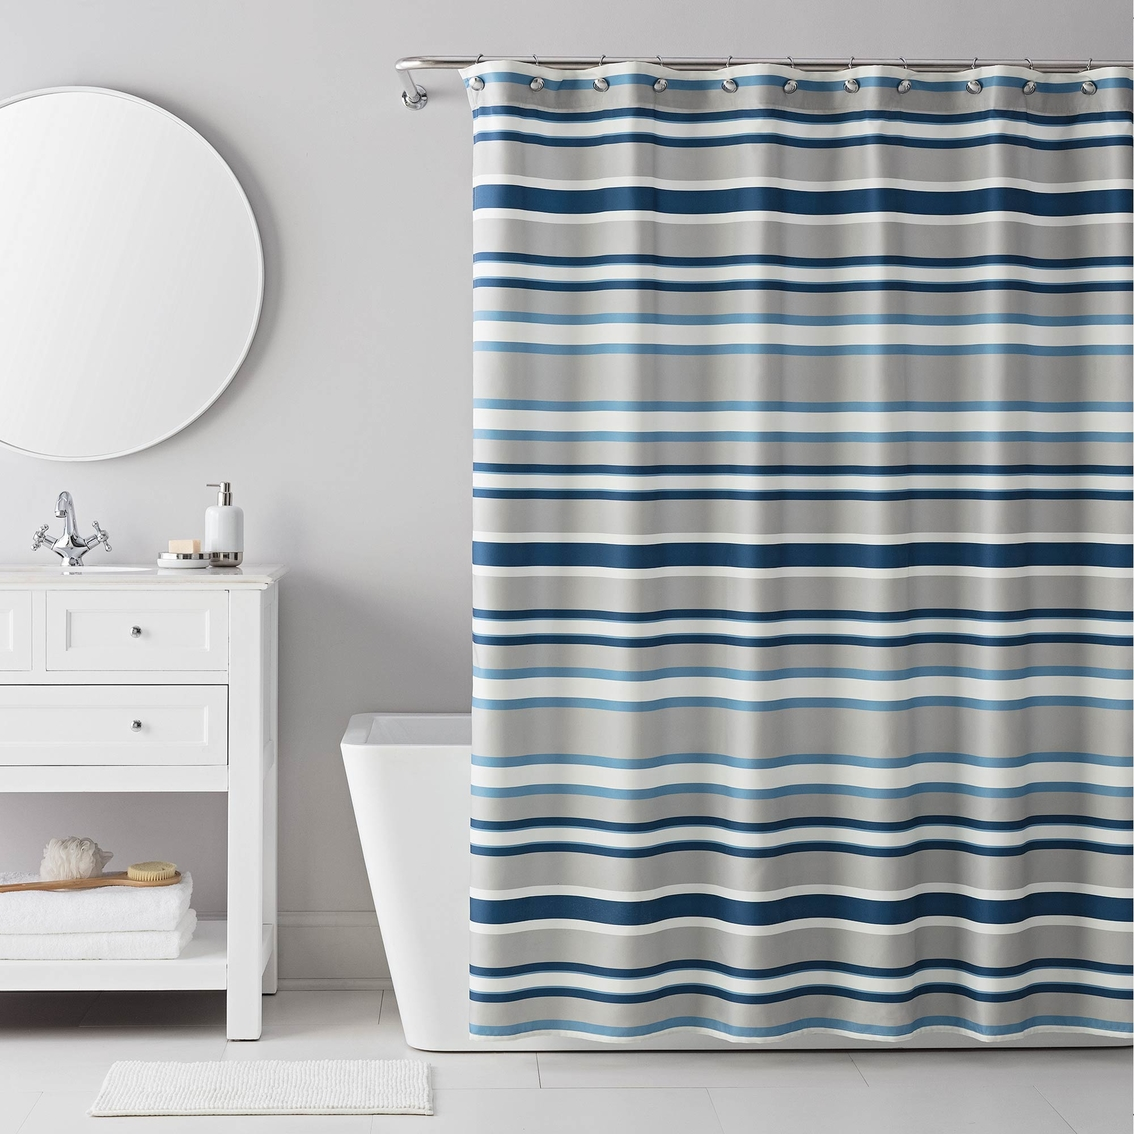 Izod Bradley Stripes Shower Curtain And Rings Set Shower